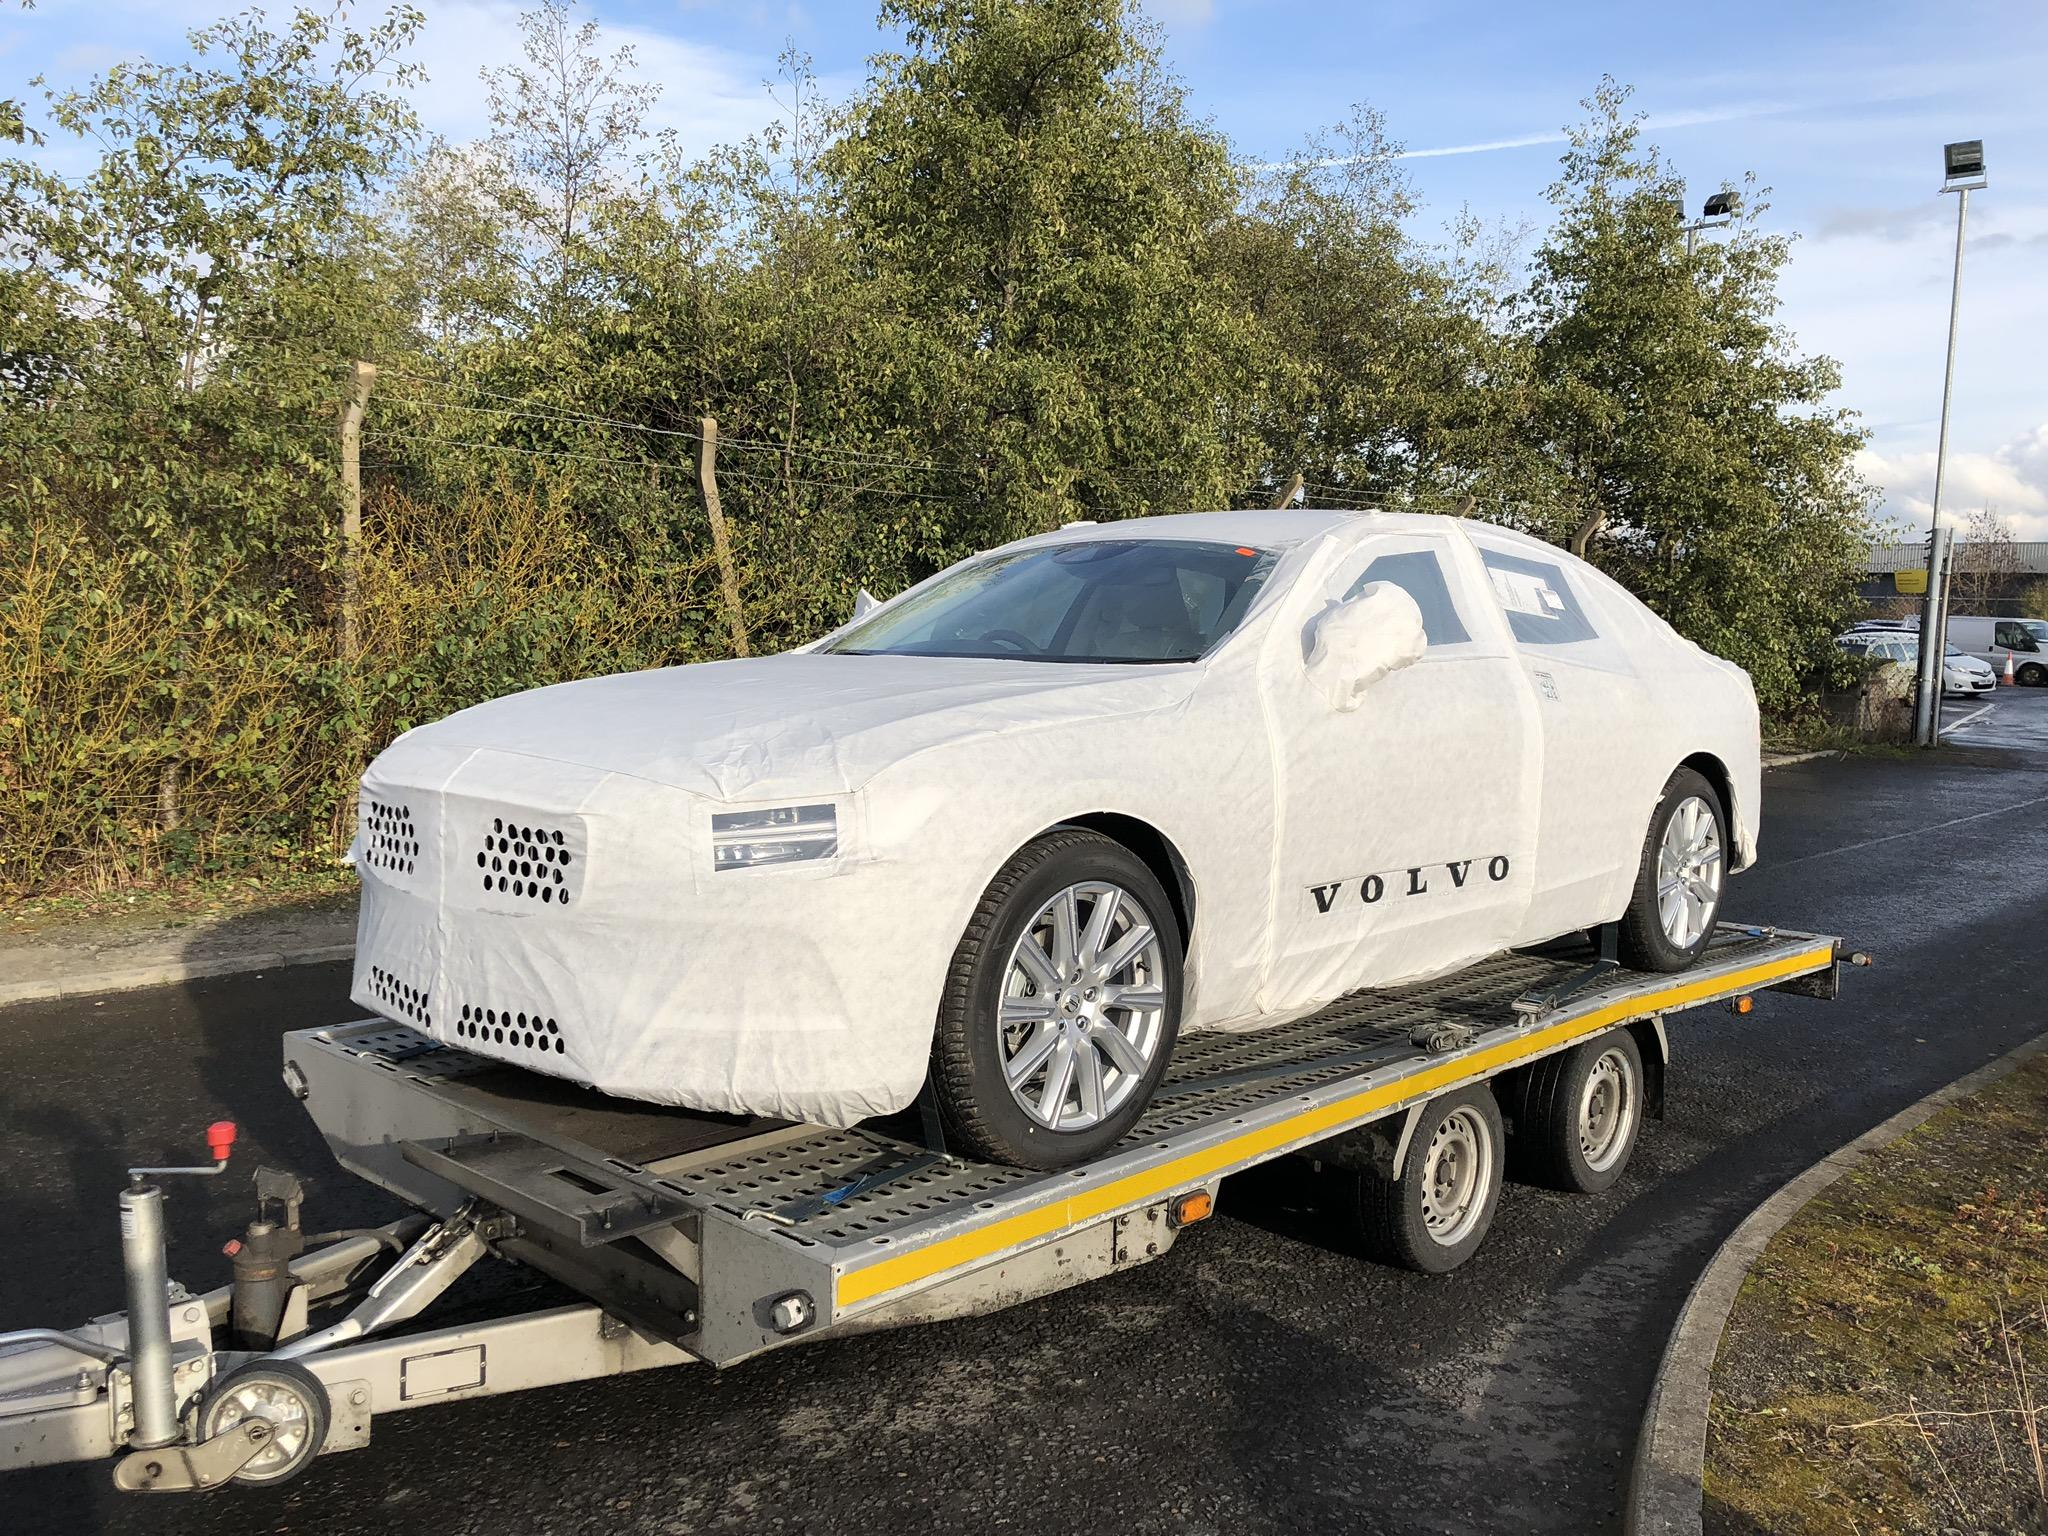 Volvo S60 Dealer Transfer